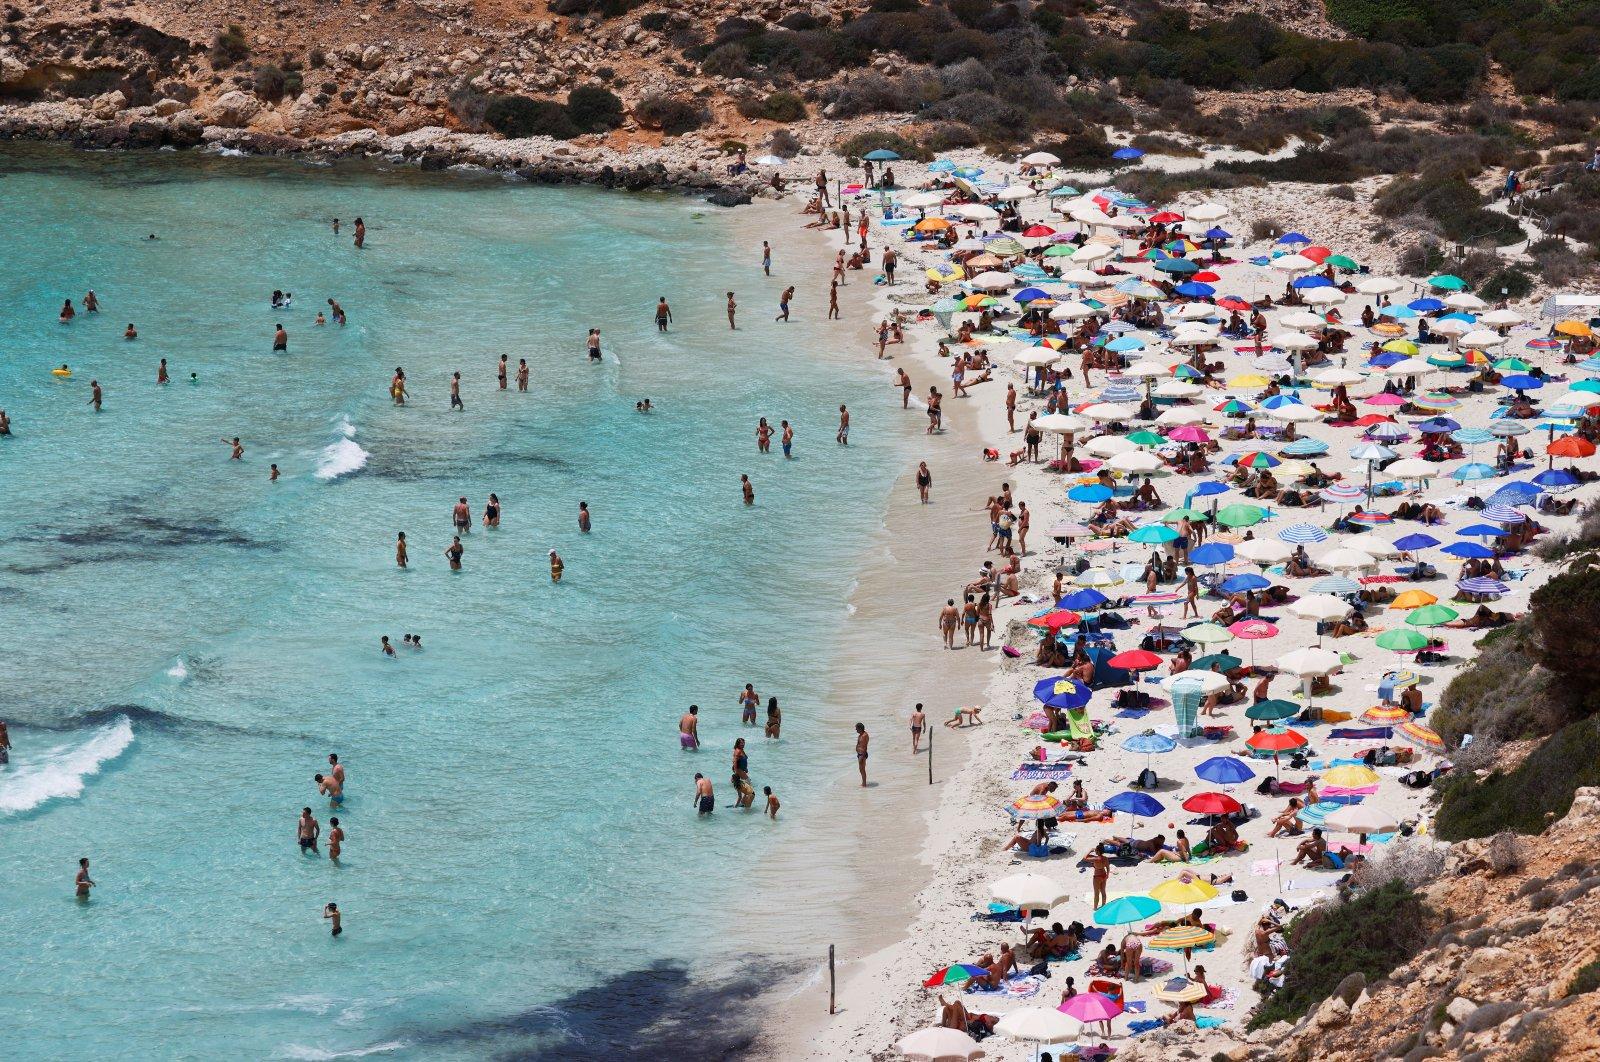 People sunbathe on the beach on the Sicilian island of Lampedusa, in Lampedusa, Italy, June 22, 2021. (Reuters Photo)